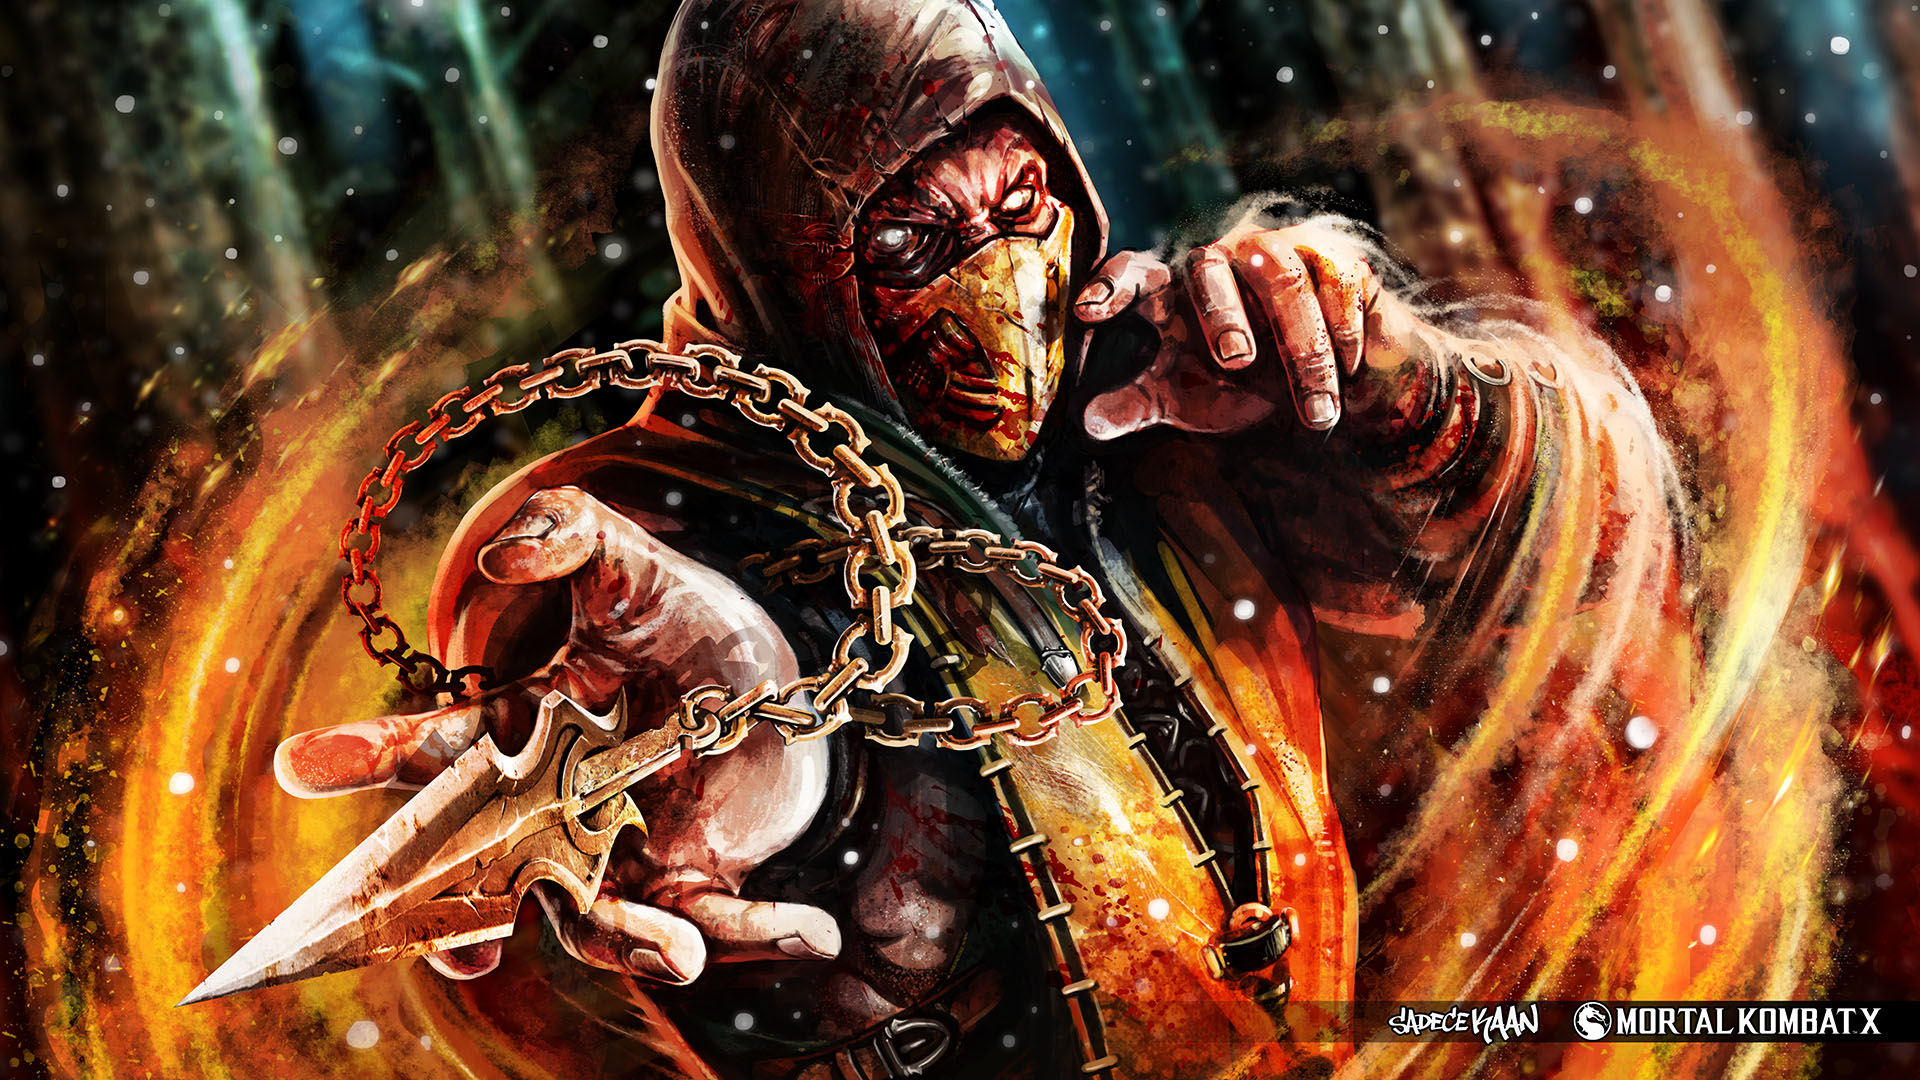 Mortal Kombat X Wallpaper Hd Video Games Blogger